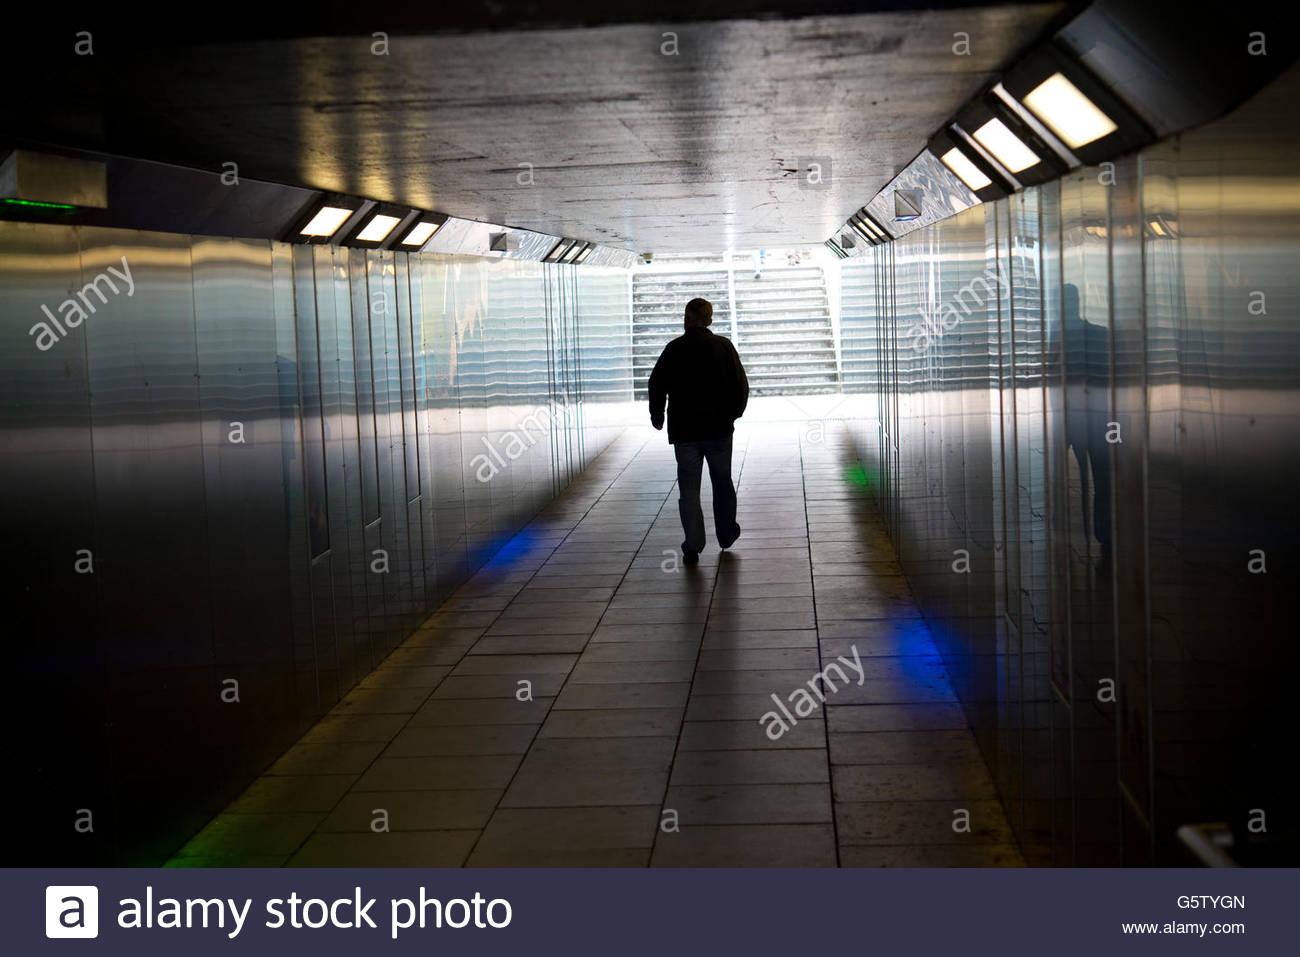 Man walking through underpass Stock Photo: 106883973 - Alamy